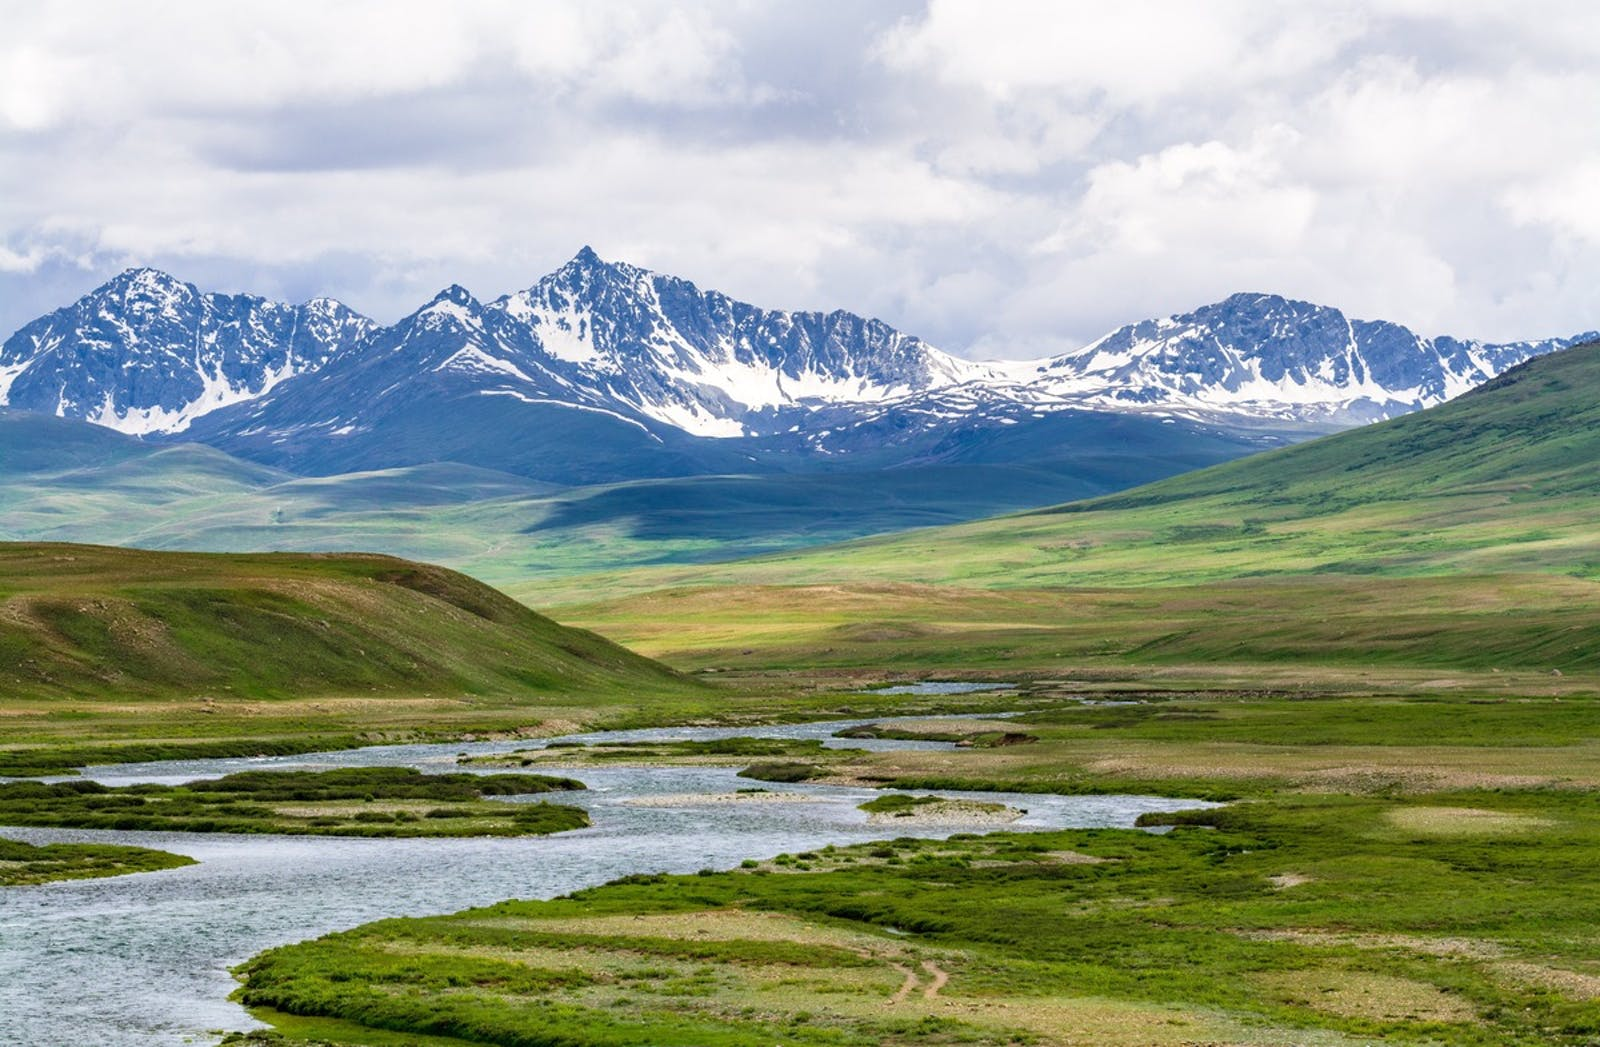 Karakoram-West Tibetan Plateau Alpine Steppe